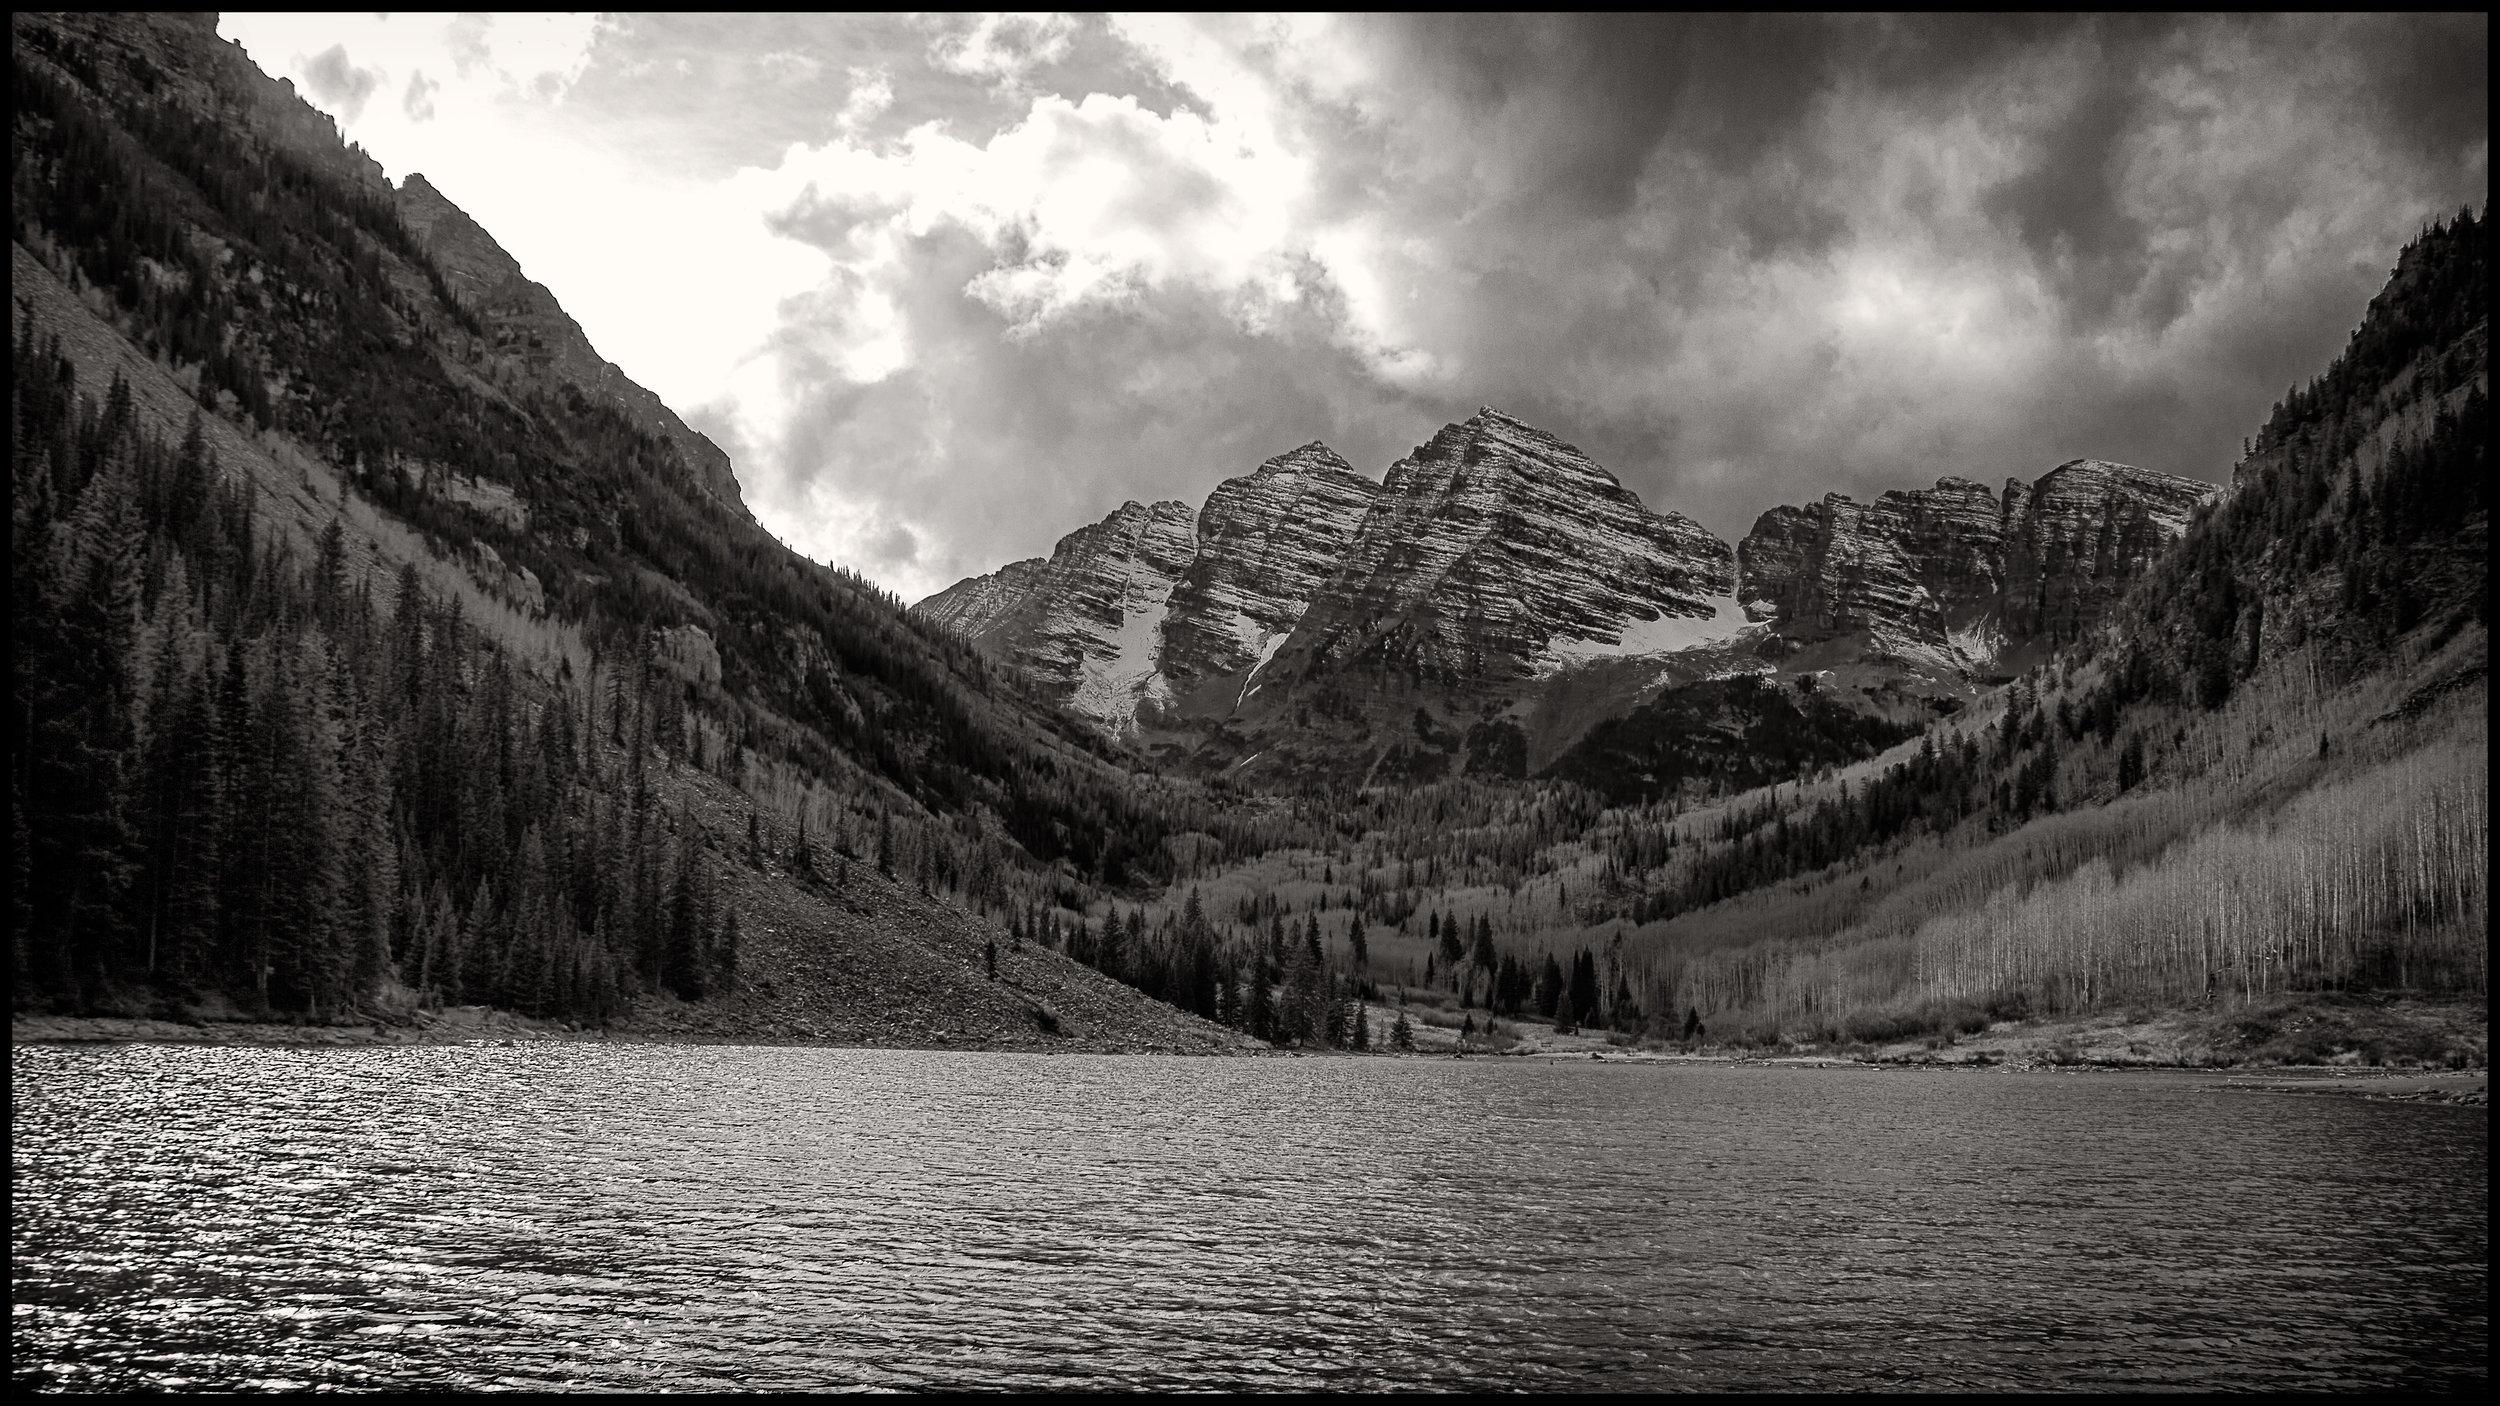 Maroon Bells, Aspen/Snowmass Colorado